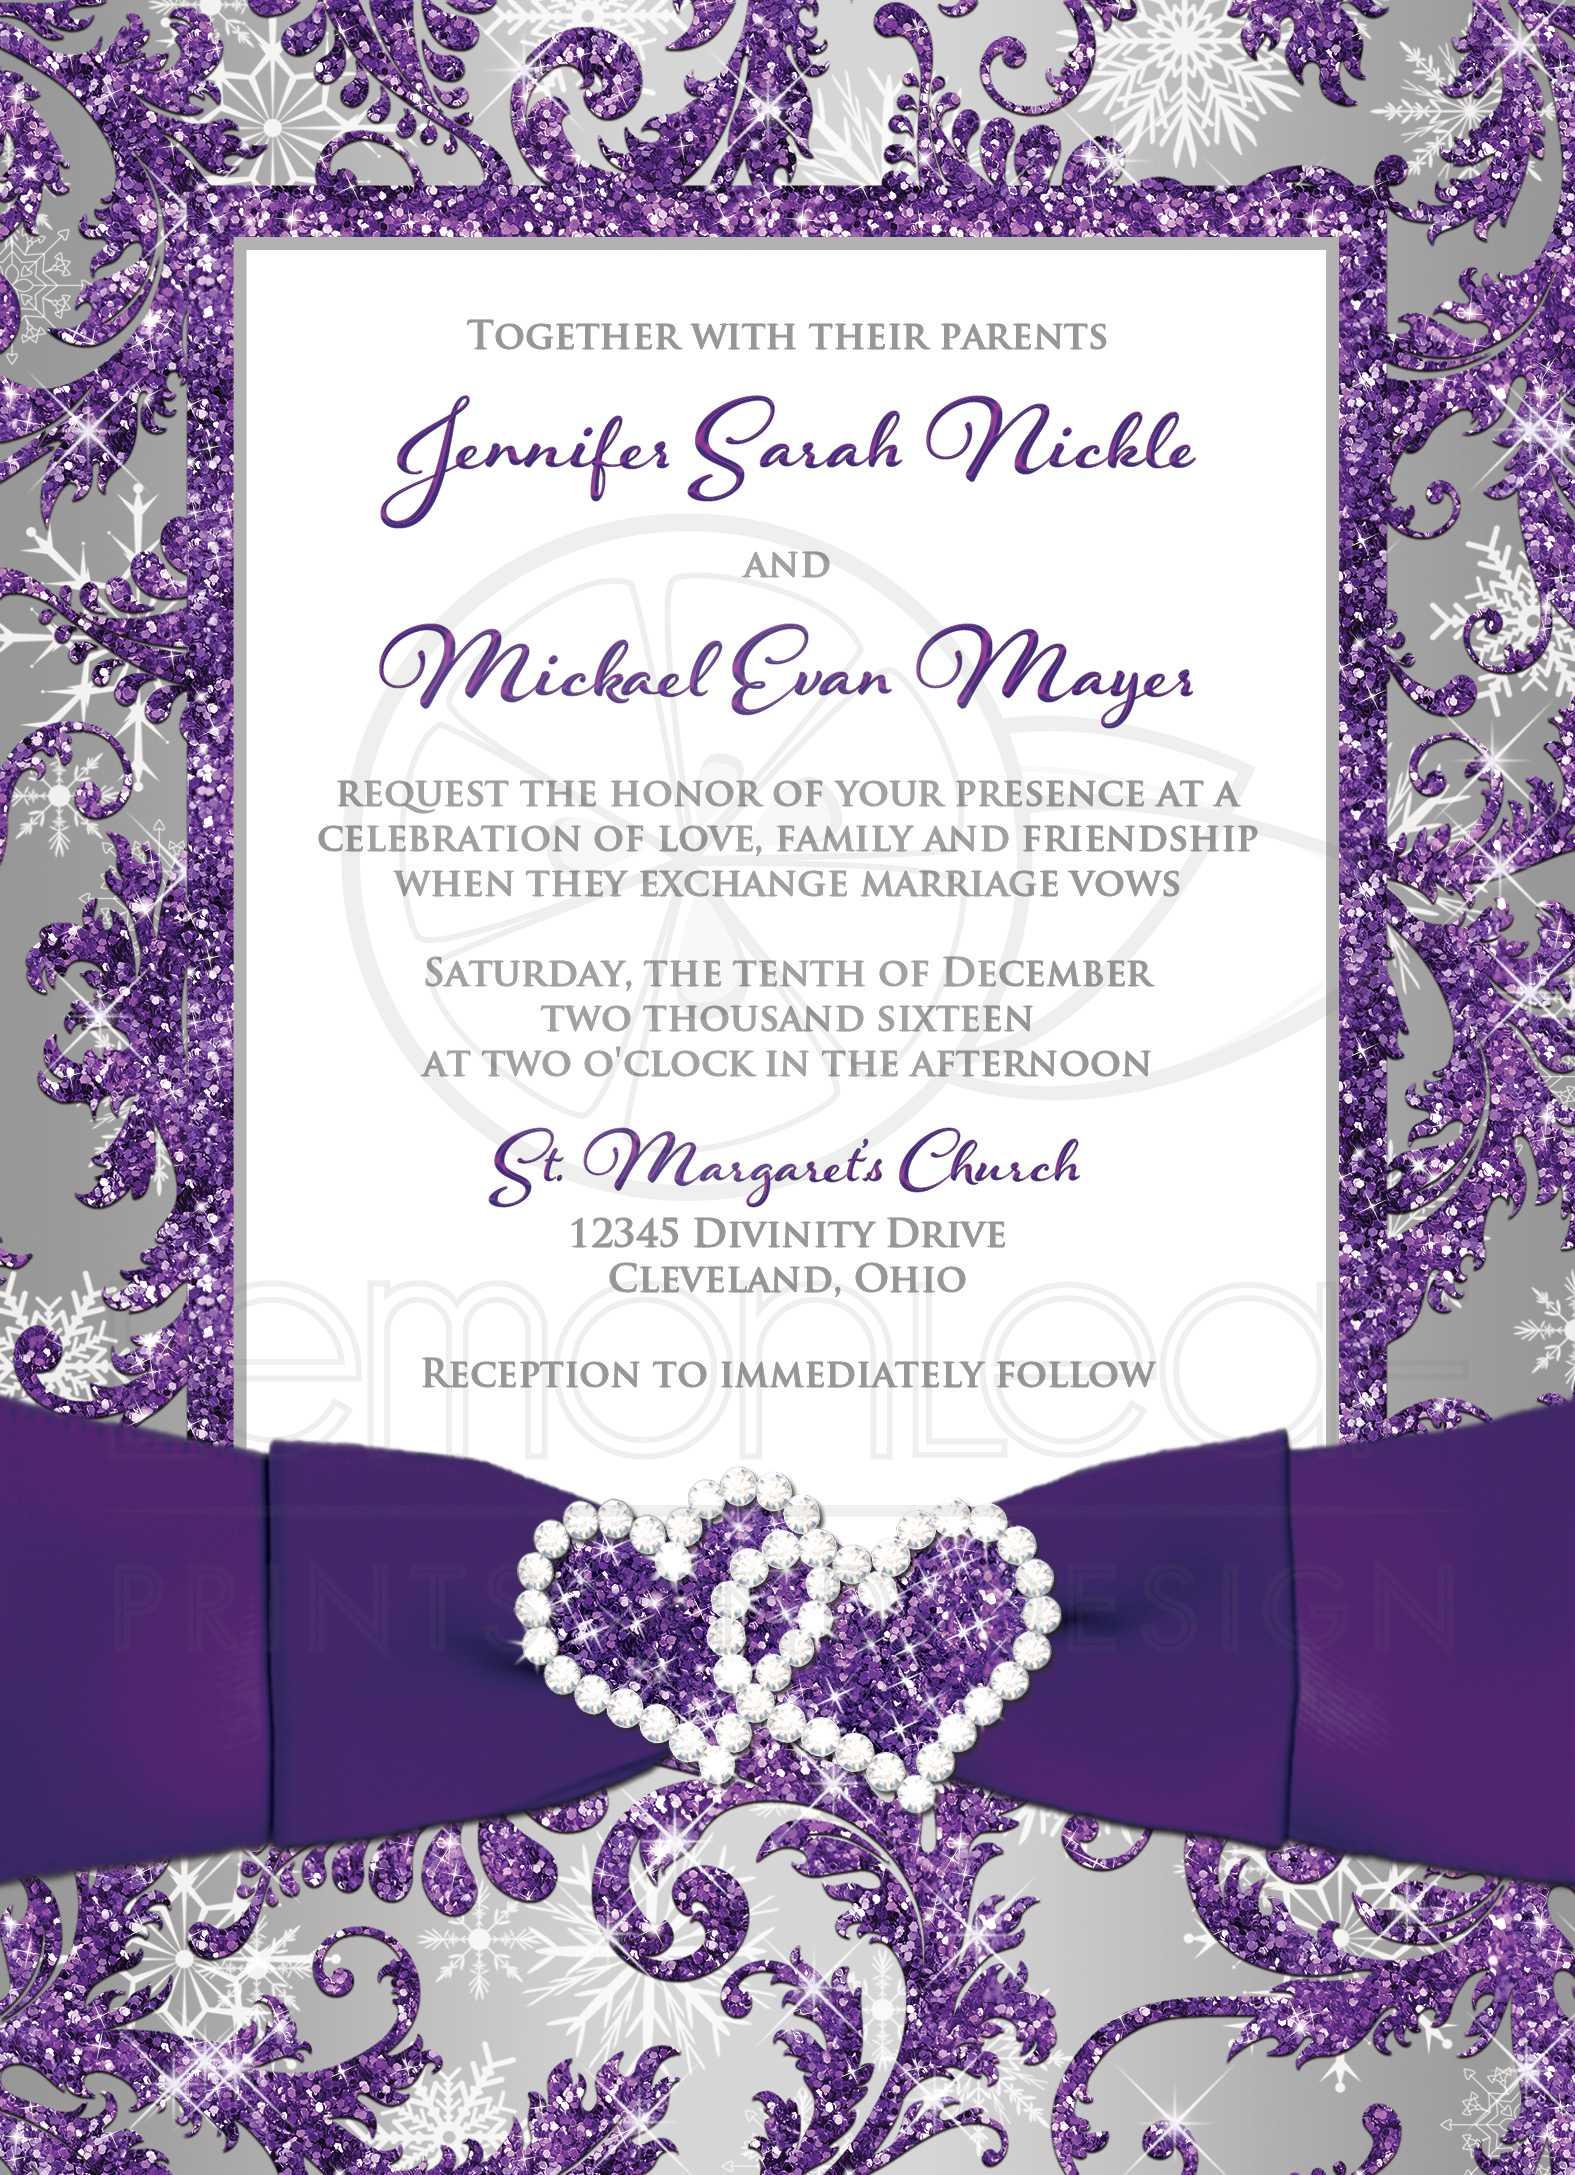 Winter Wonderland PHOTO Wedding Invitation | Purple, Silver, White  Snowflakes | Printed Jewel, Faux Glitter Joined Hearts